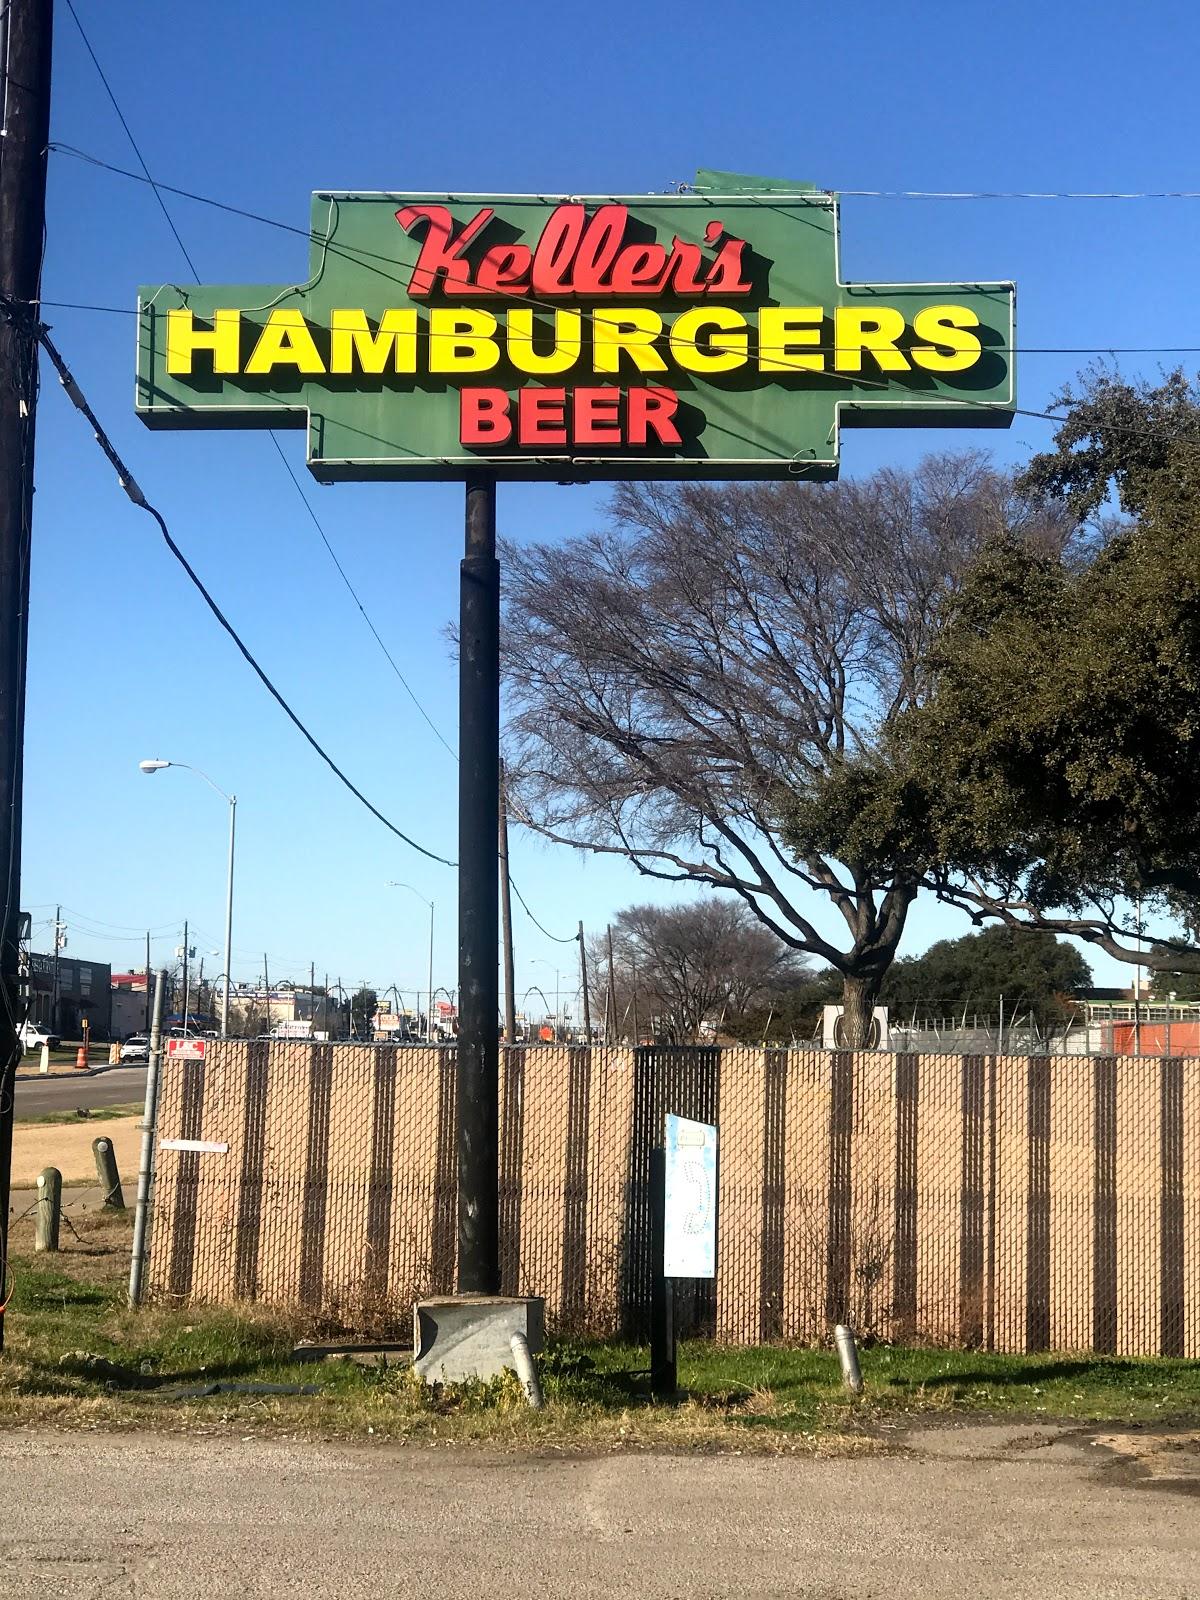 Keller's located in Dallas Texas off Harry Hines